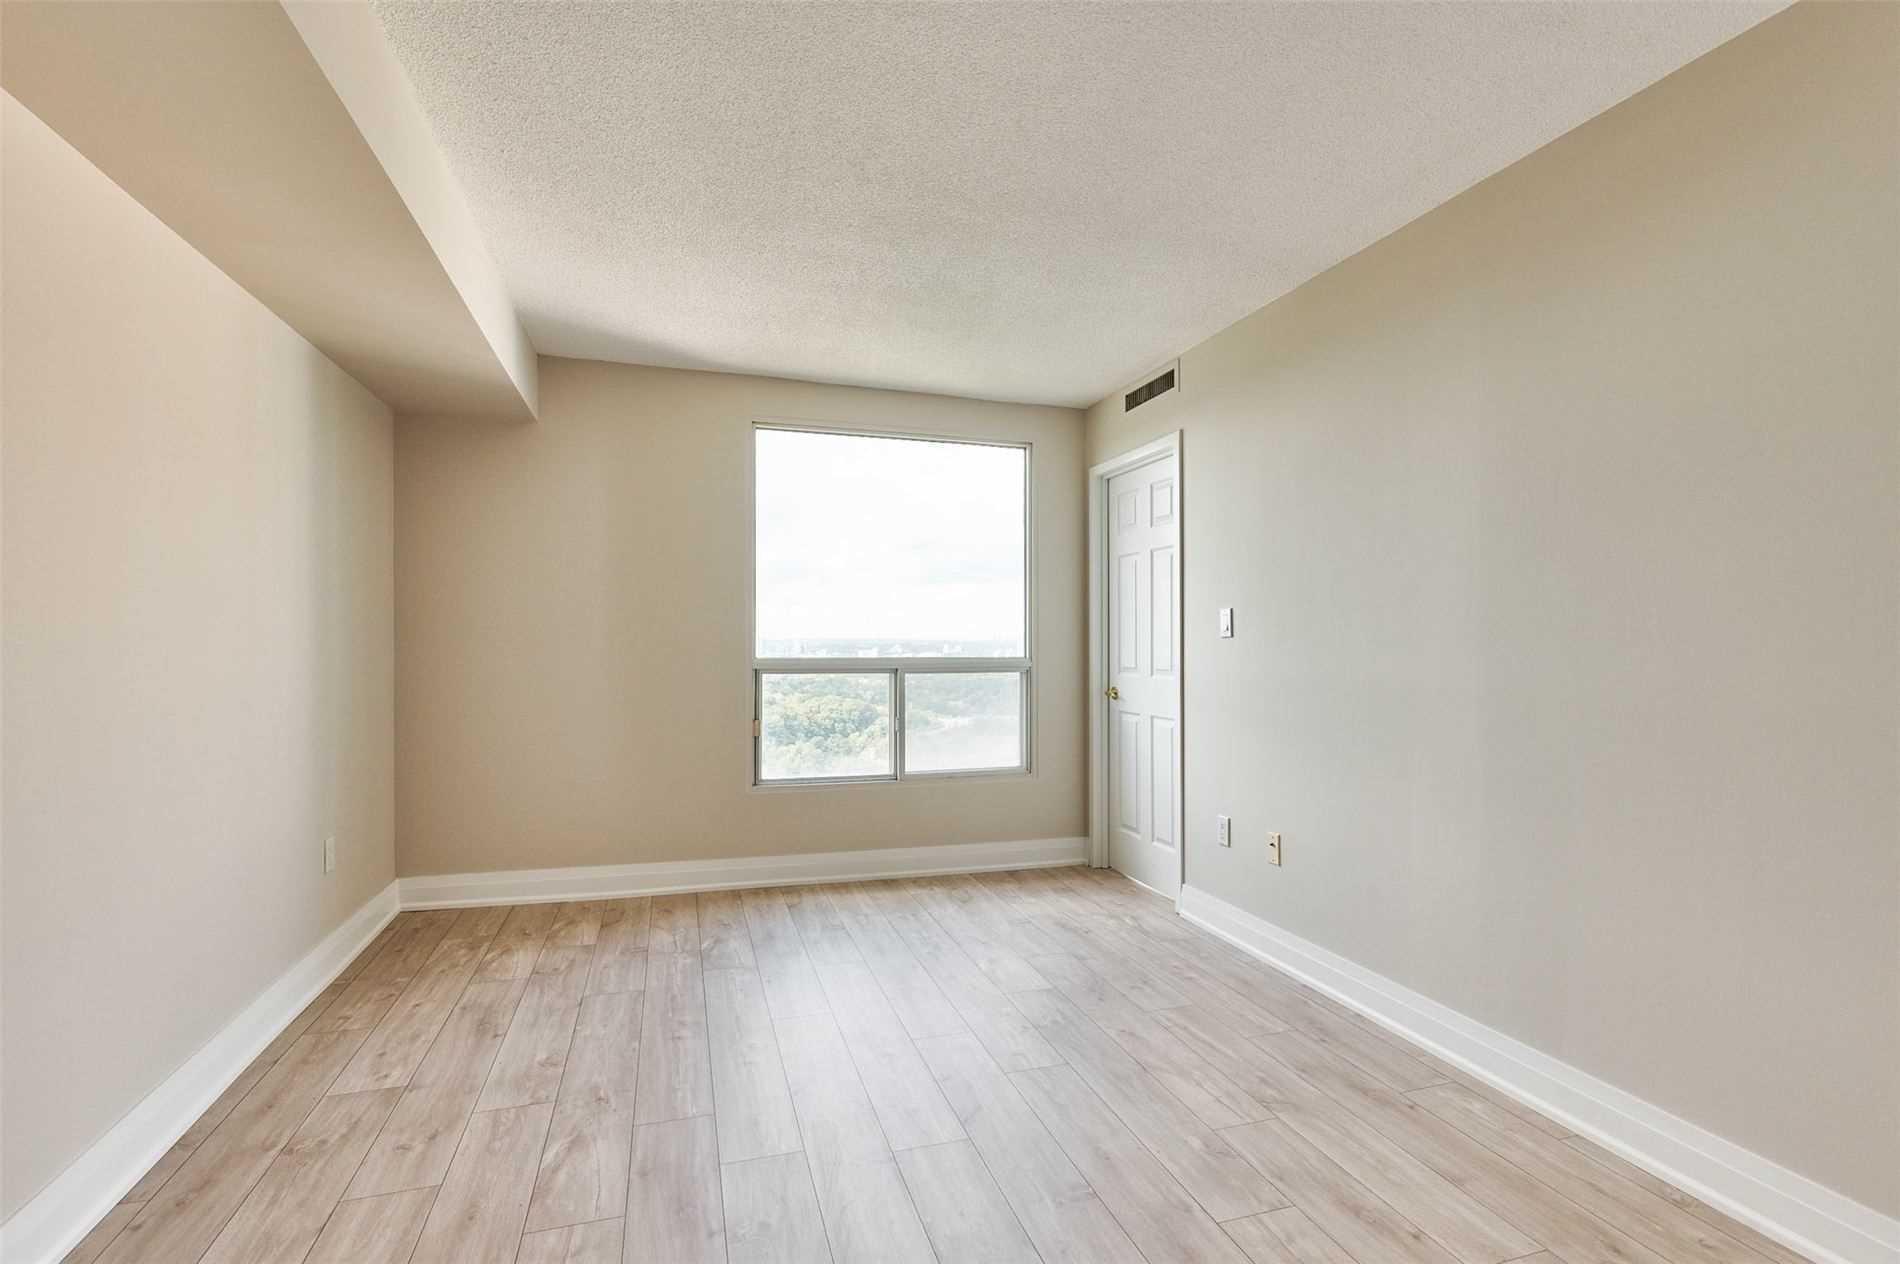 Condo Apt For Sale In Toronto , 2 Bedrooms Bedrooms, ,2 BathroomsBathrooms,Condo Apt,For Sale,3507,Concorde